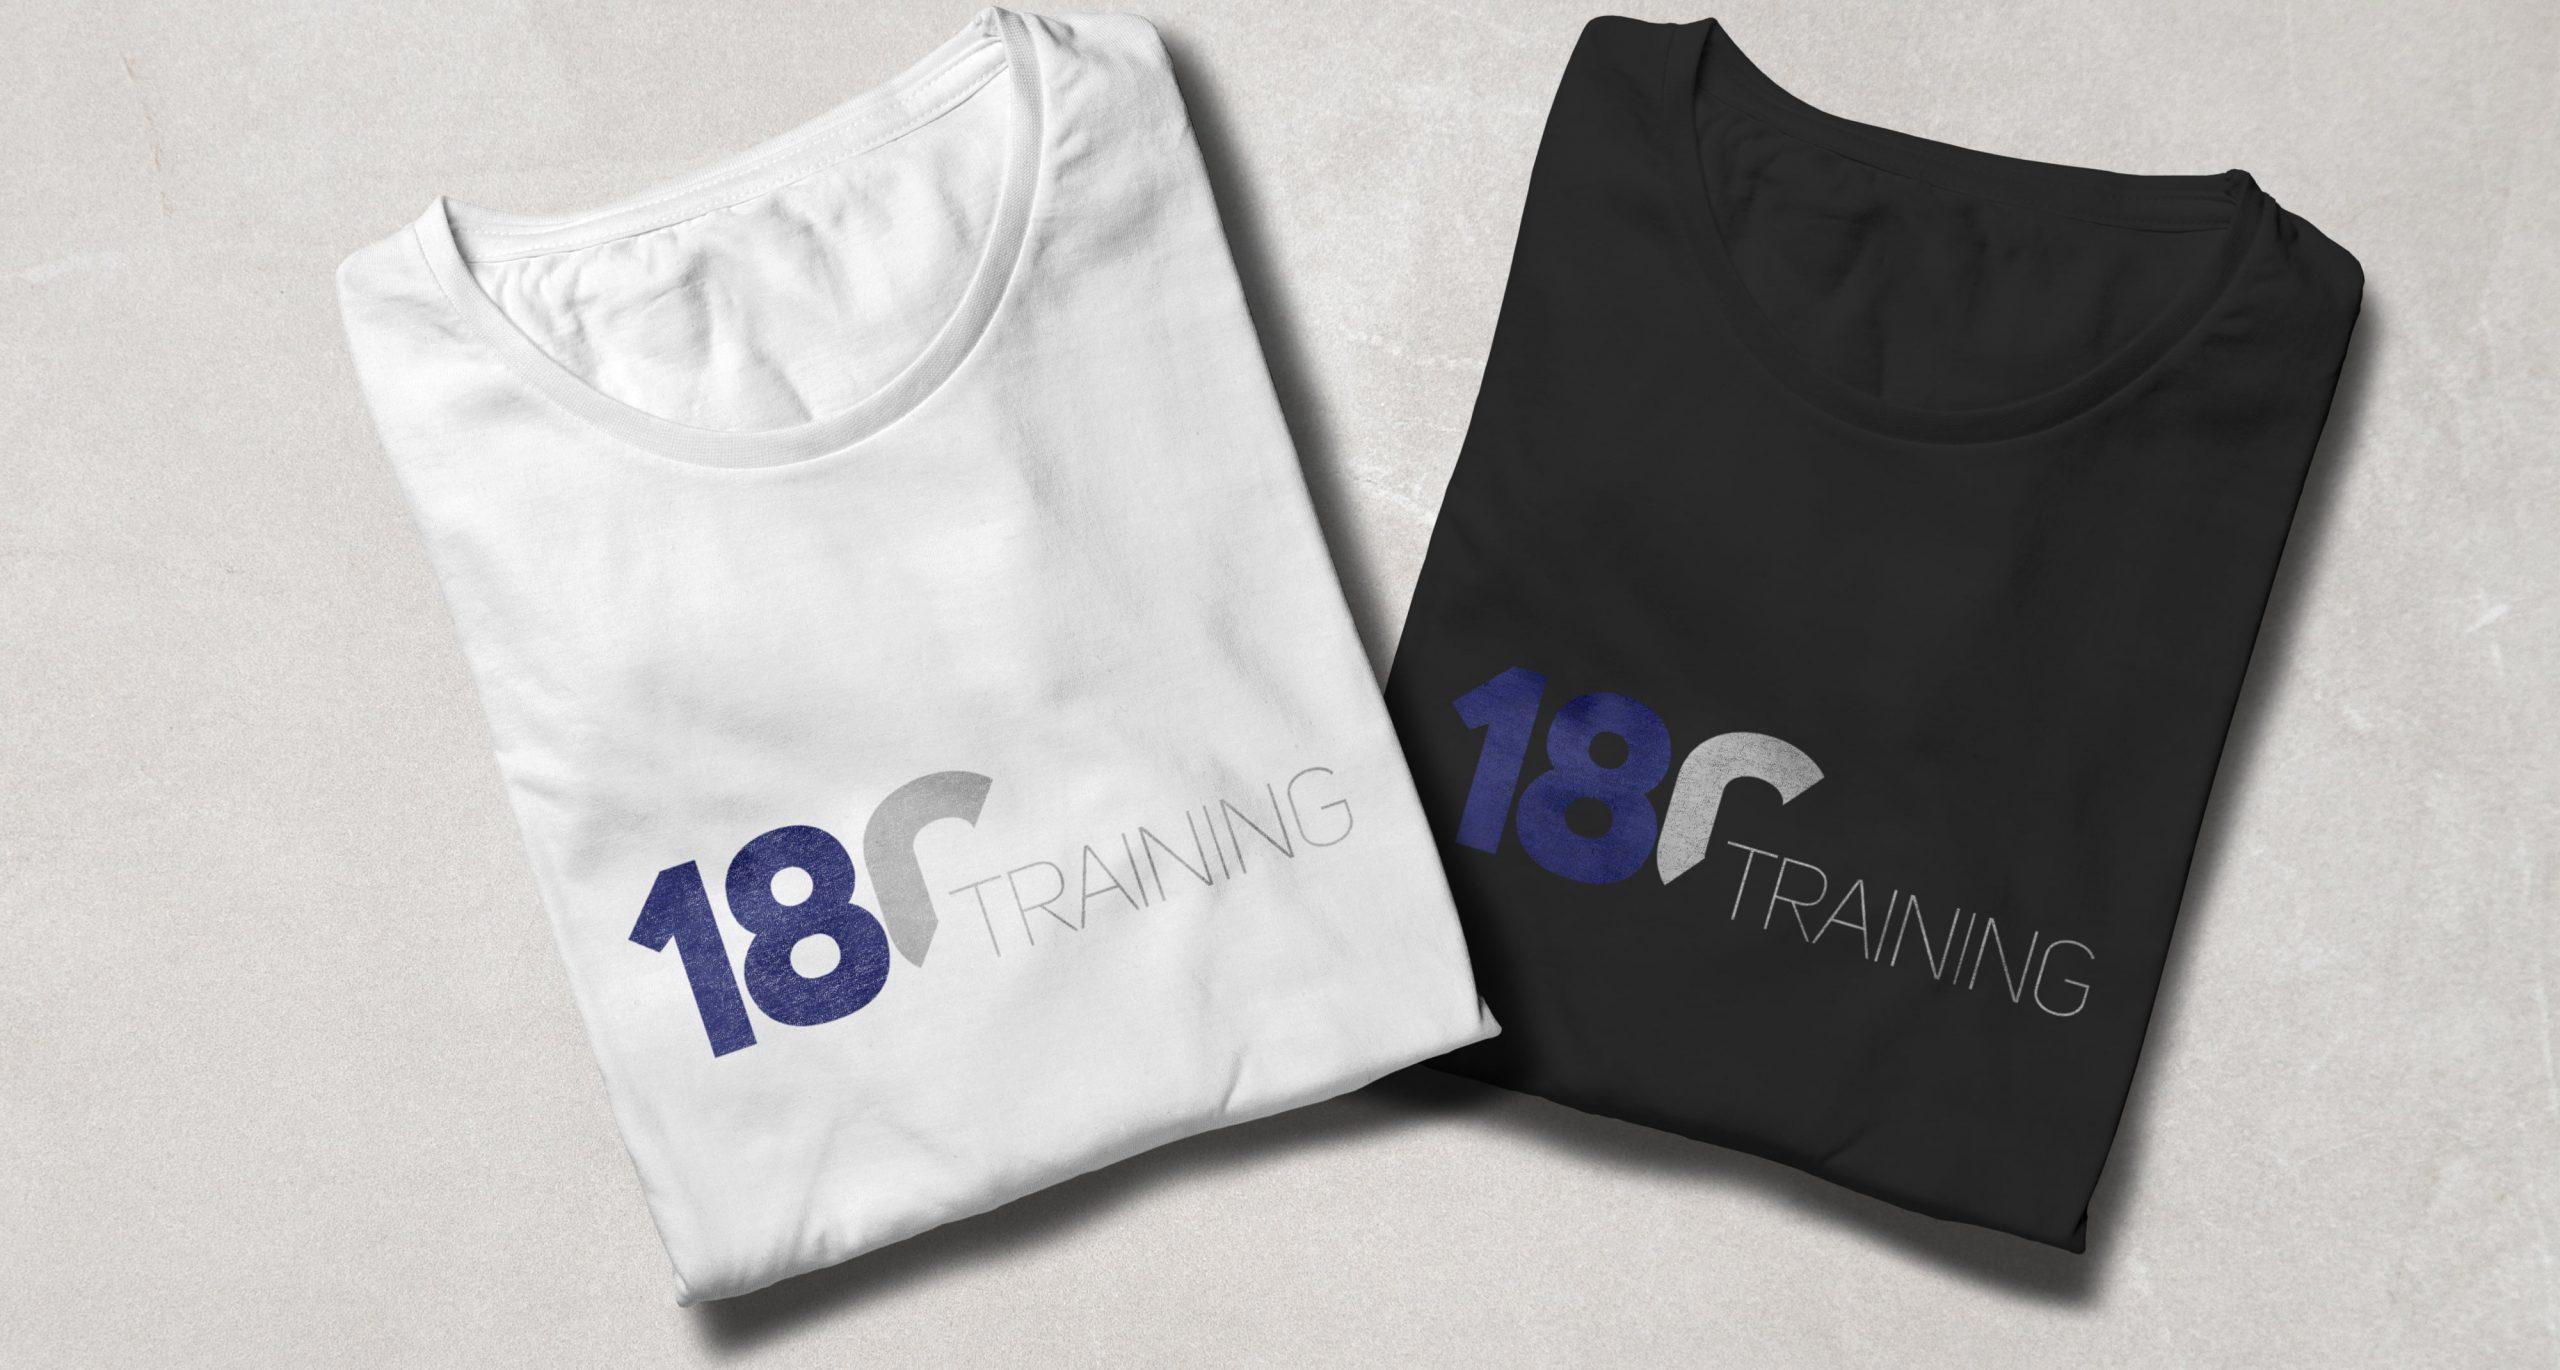 180 Training logo design on T-shirts